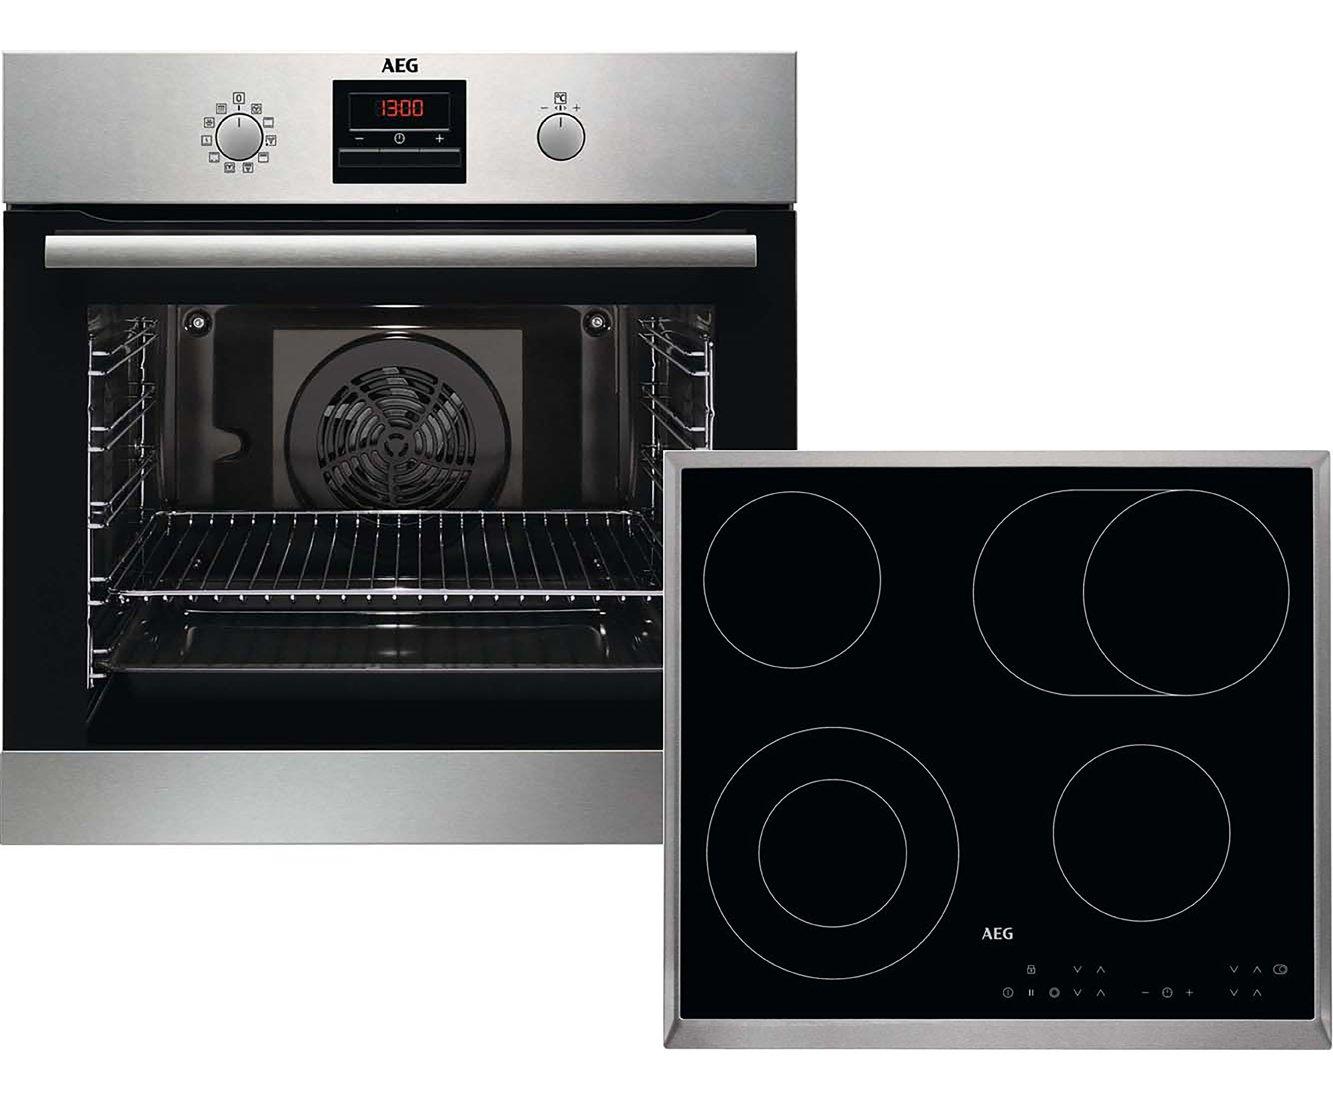 AEG Kombi B 302 P Cerámico Horno eléctrico sets de electrodoméstico de cocina - Sets de electrodomésticos de cocina (Cerámico, Vidrio y cerámica, Negro, ...